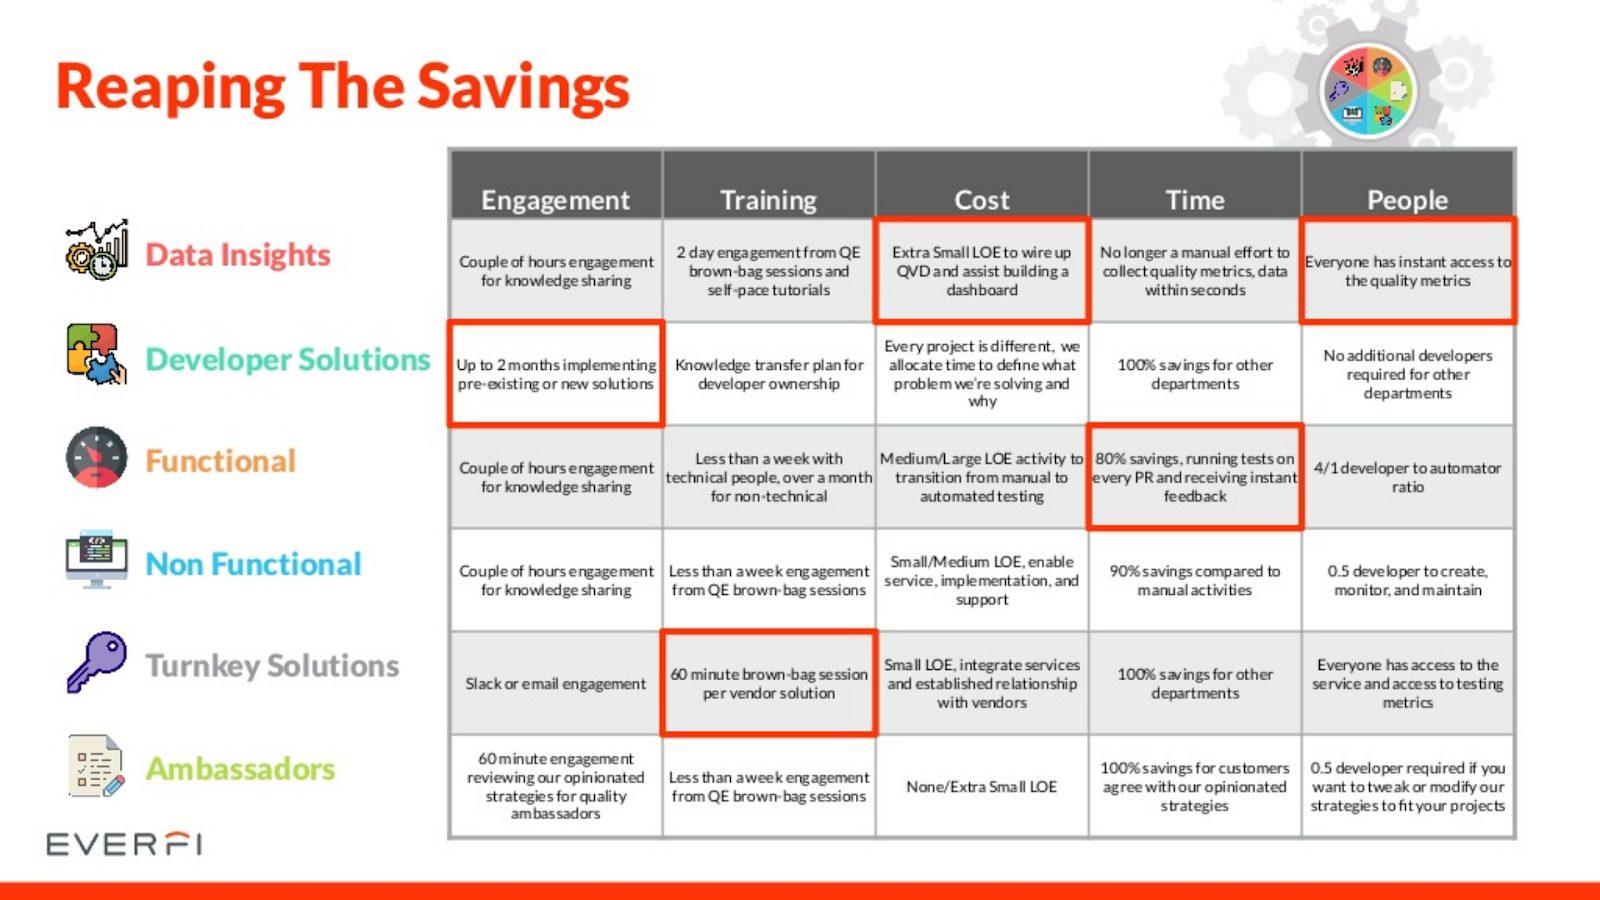 reaping the savings